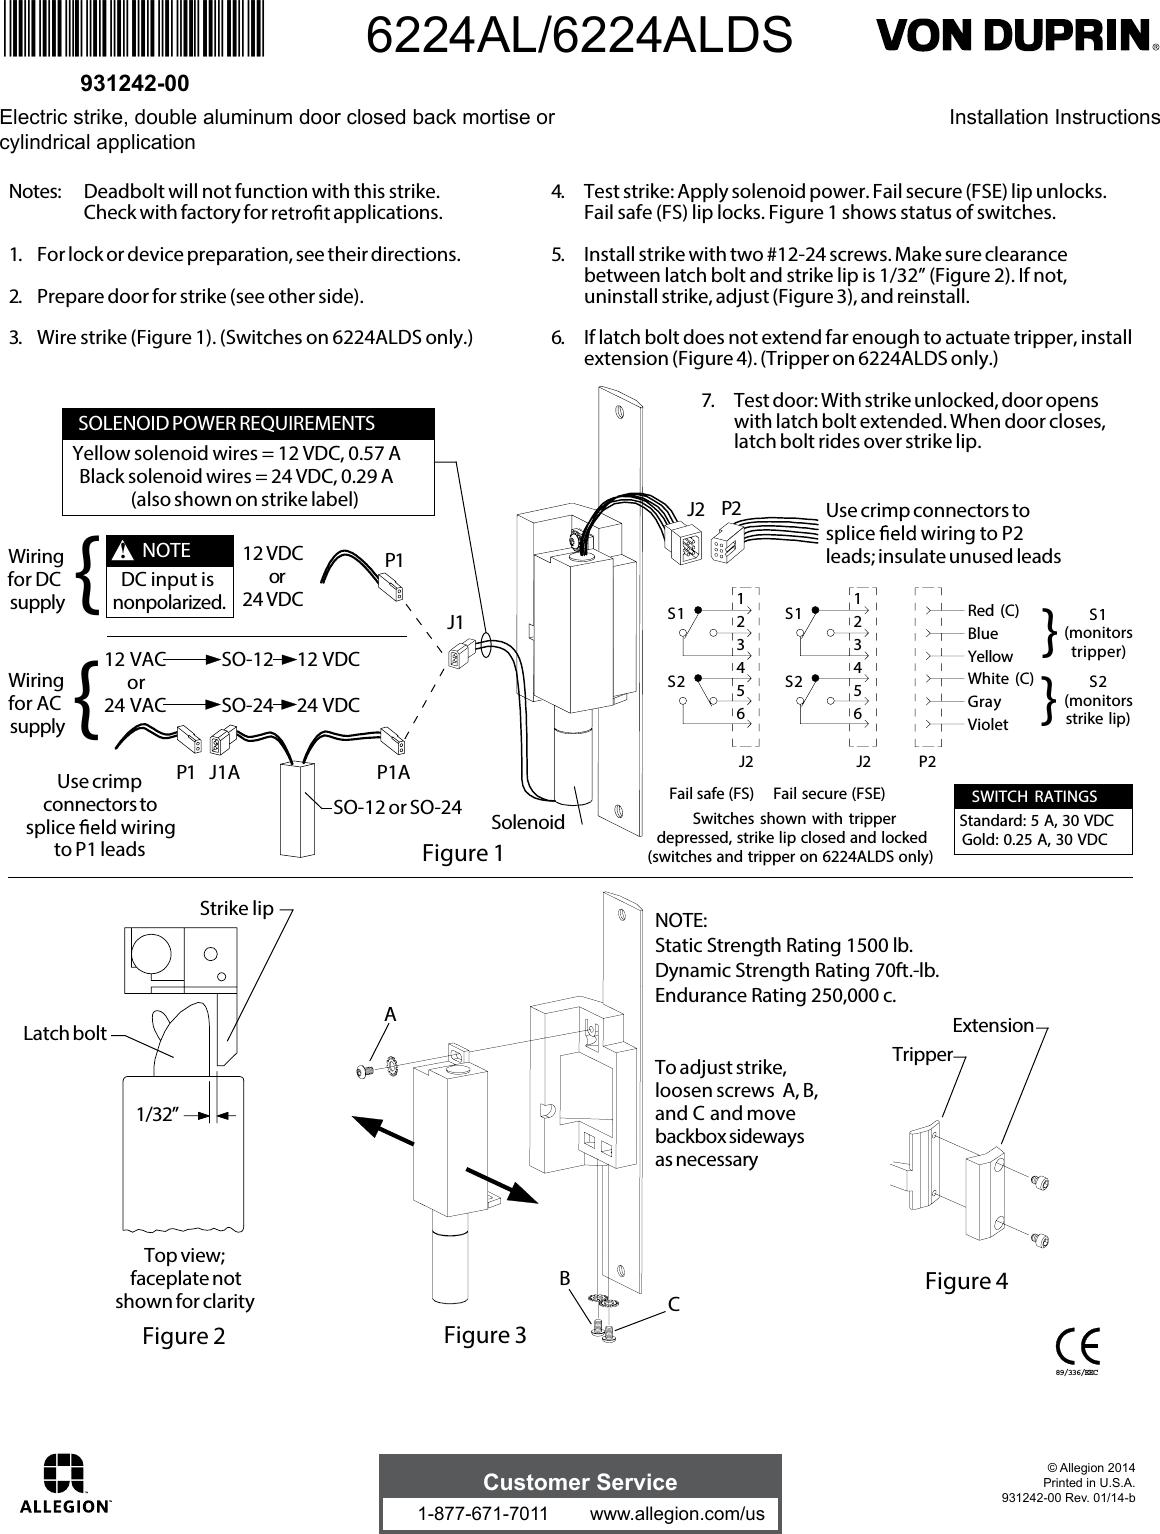 97 2 Von Duprin 6100 Series Electric Strike 33 35a Ps873 Wiring Diagram 6224al 6224alds 107694